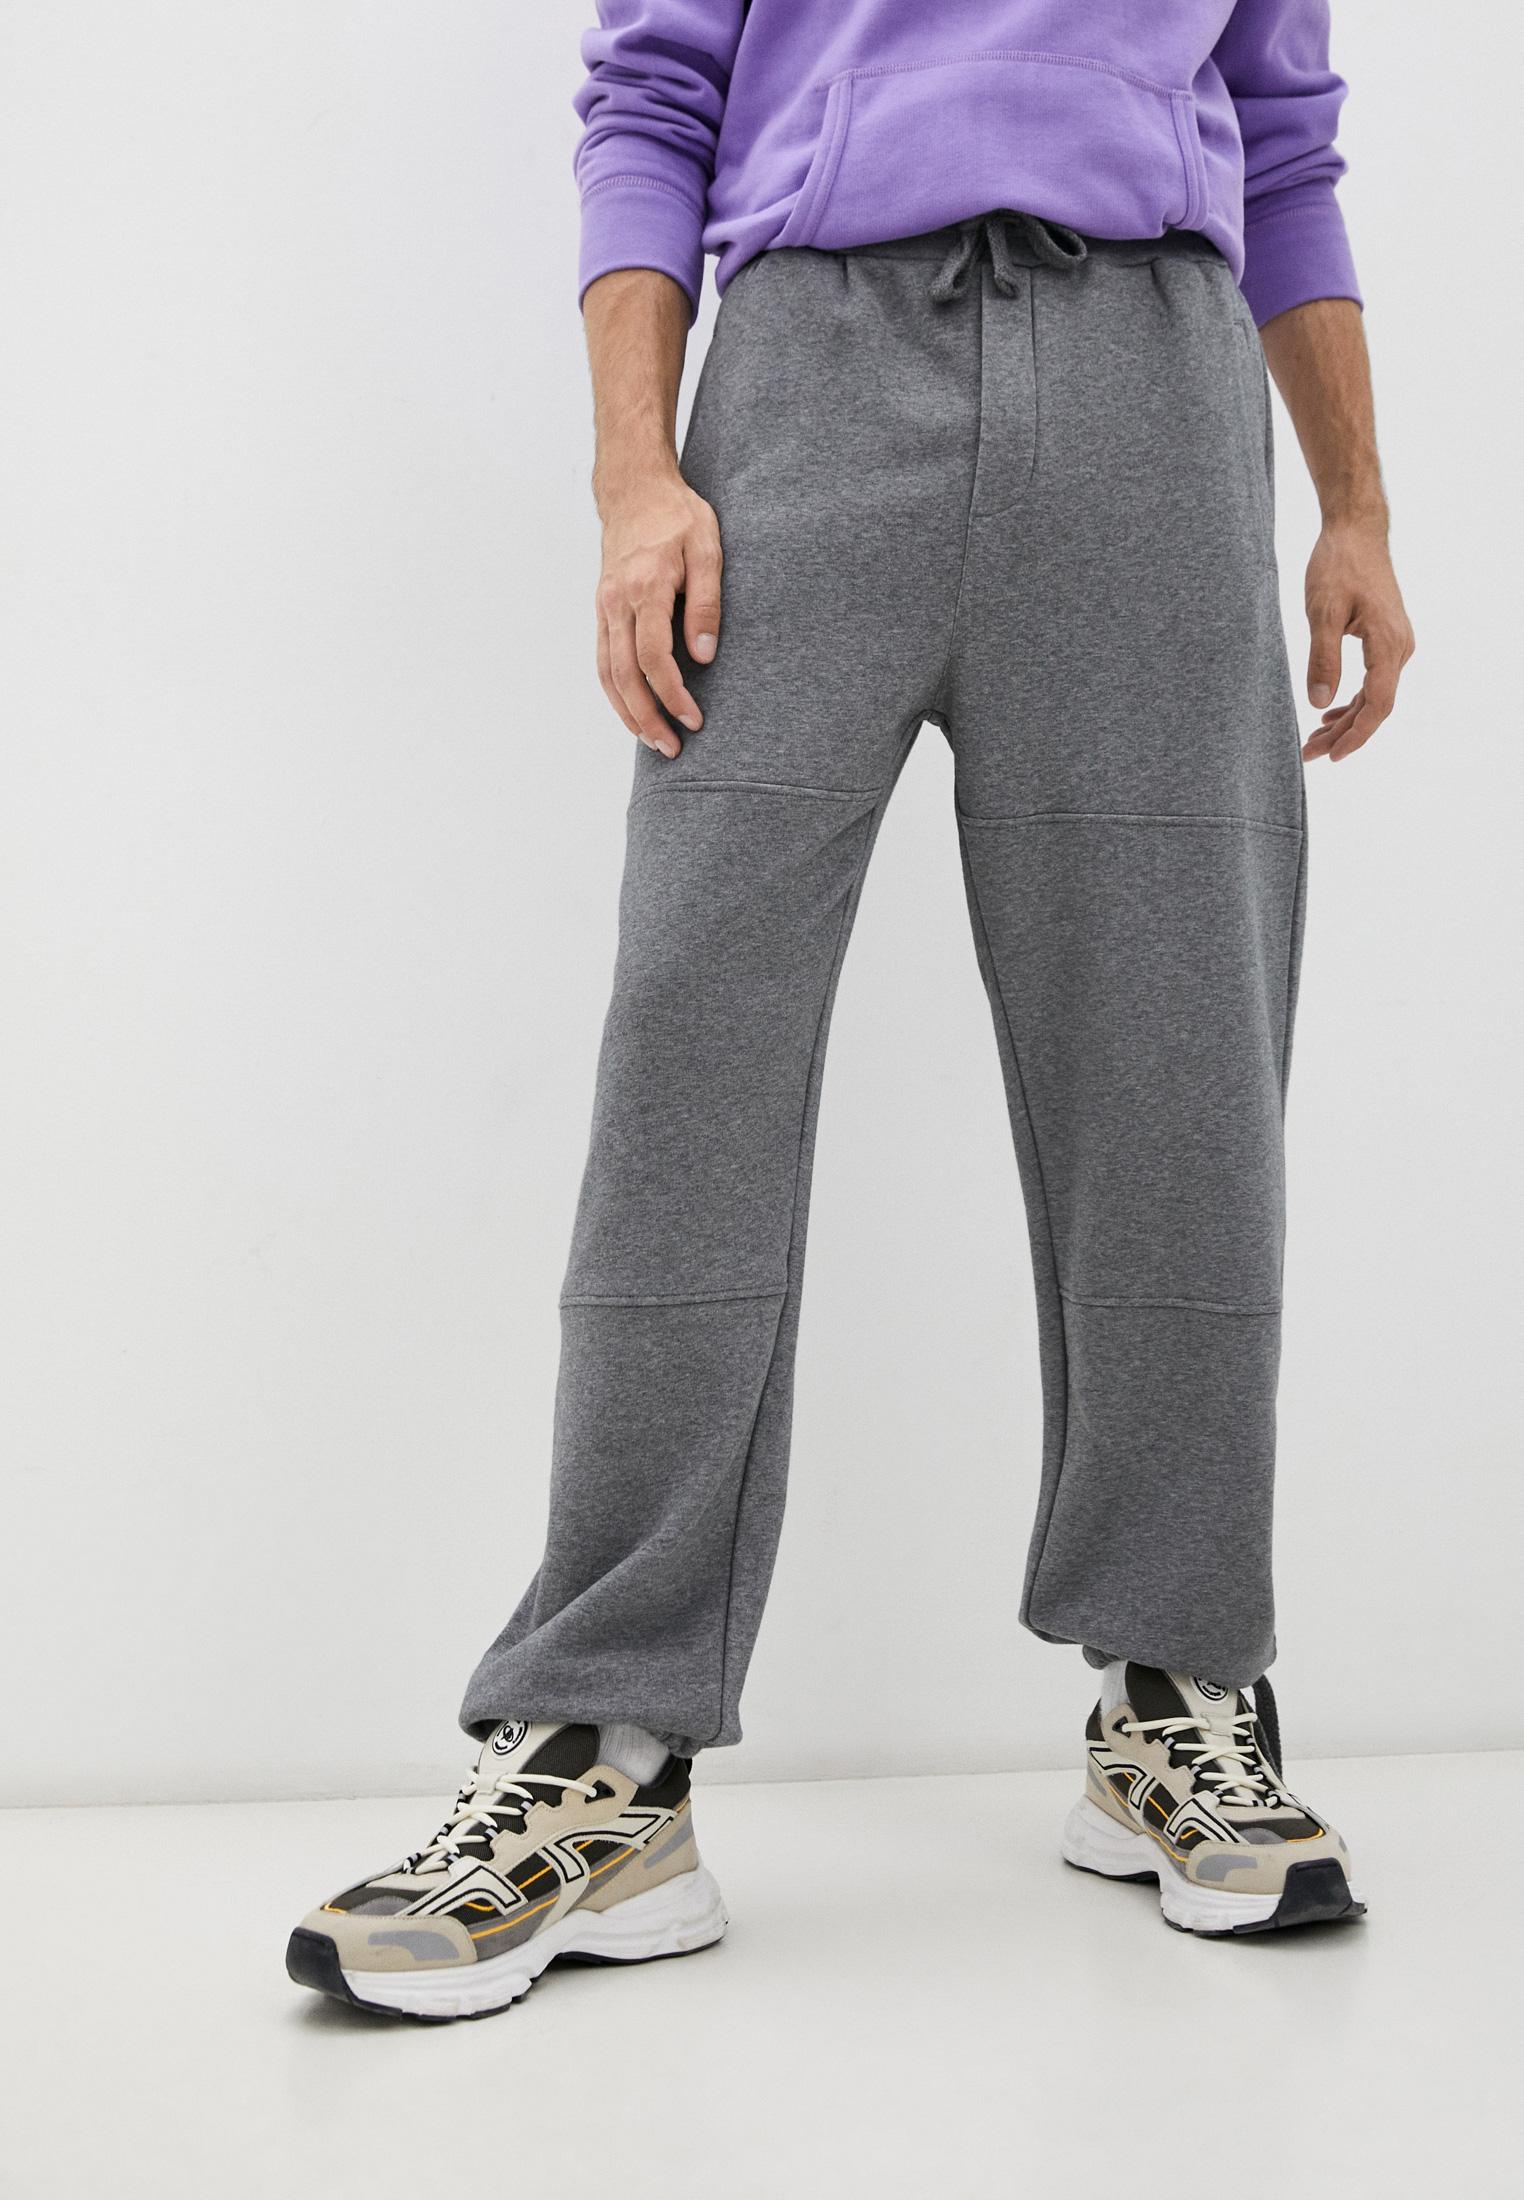 Мужские спортивные брюки Bikkembergs (Биккембергс) C 1 002 70 M 3809